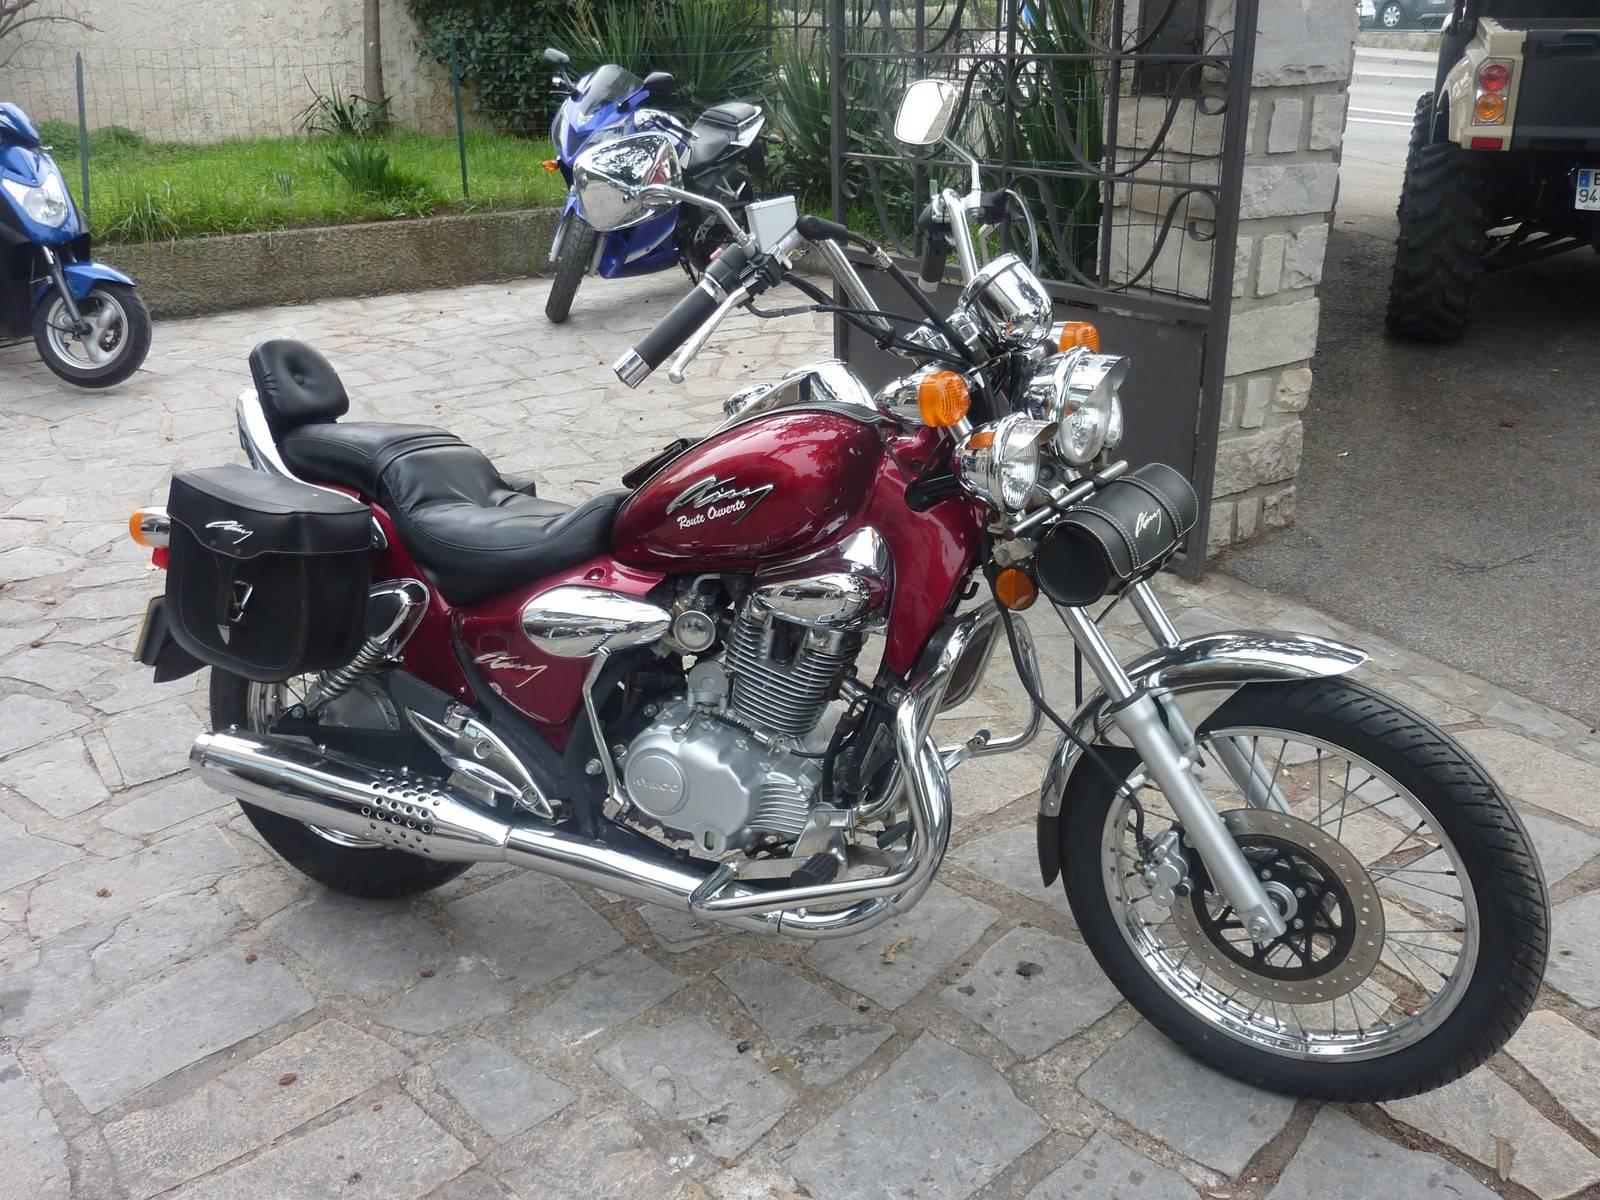 motos zing 125 cm3 kymco 1700 kms azur motos. Black Bedroom Furniture Sets. Home Design Ideas